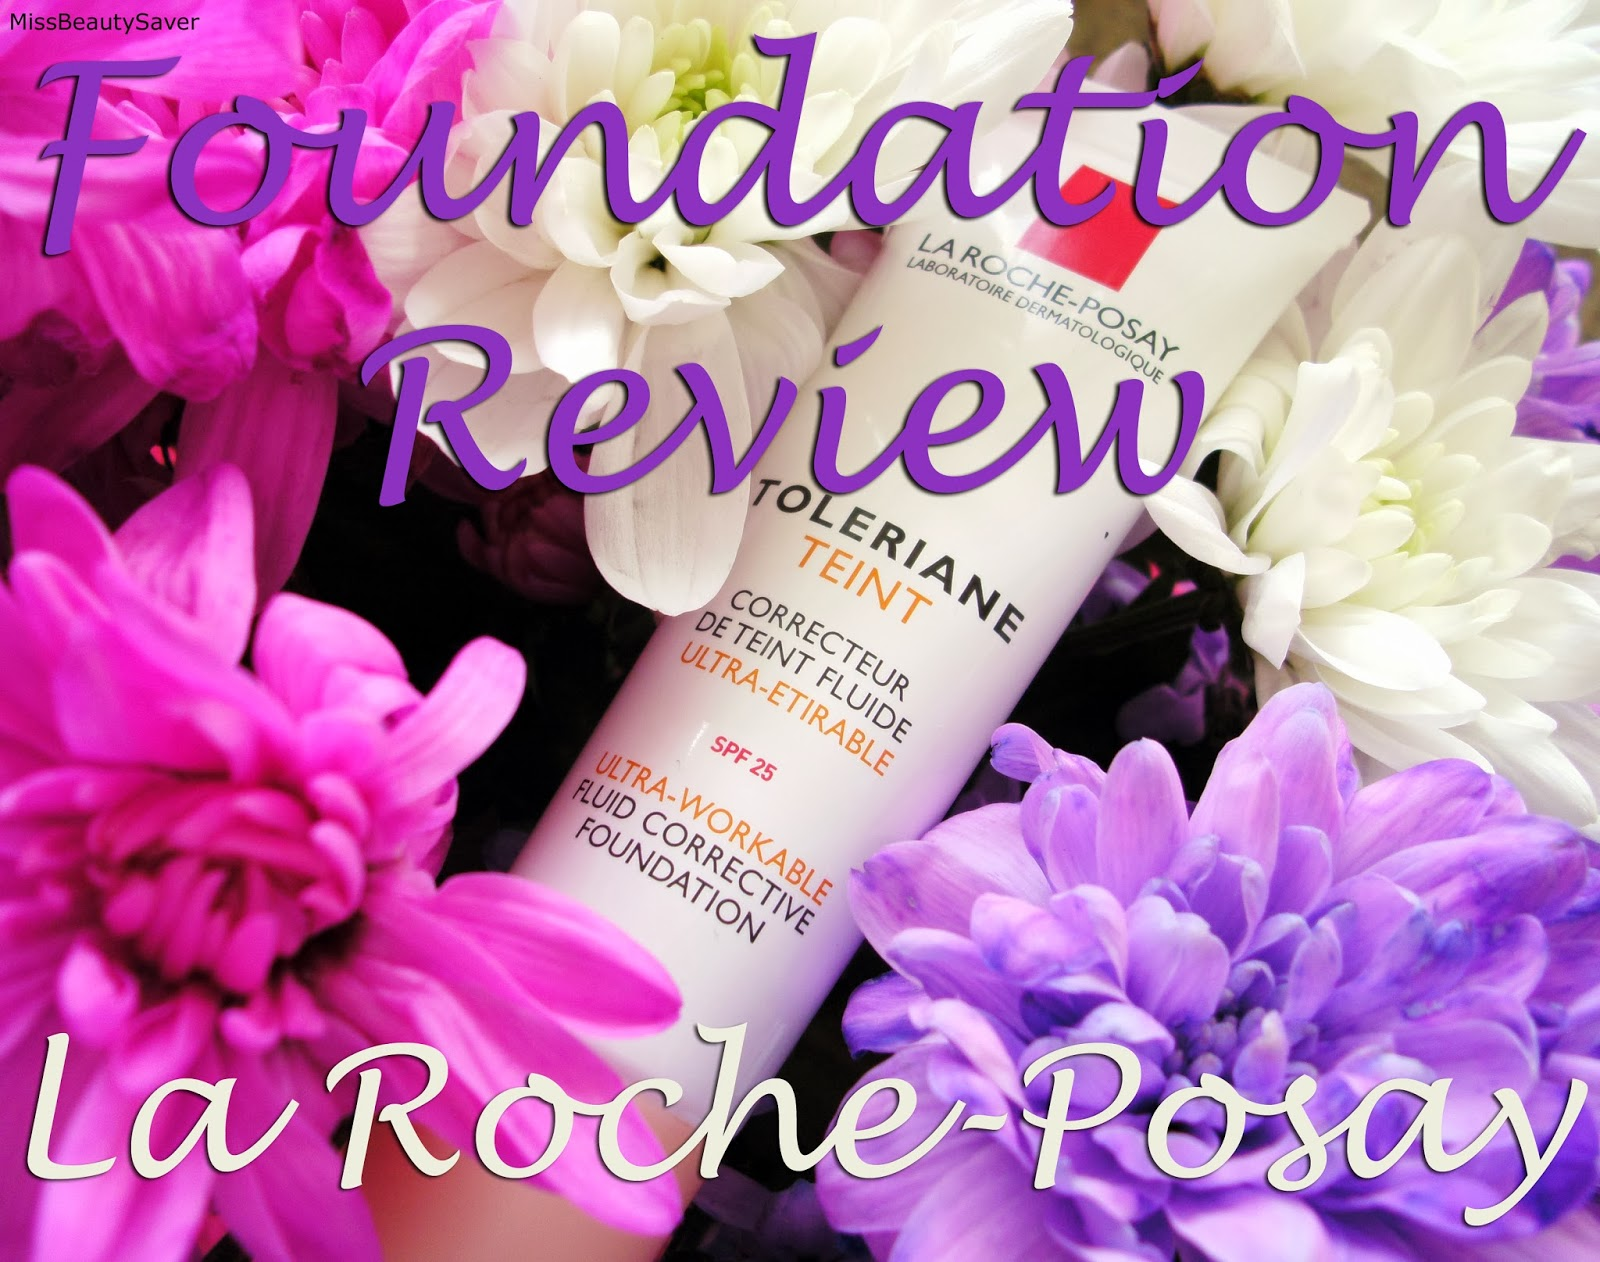 Review La Roche-Posay Toleriane Teint Correcteur De Teint Fluid SPF 25